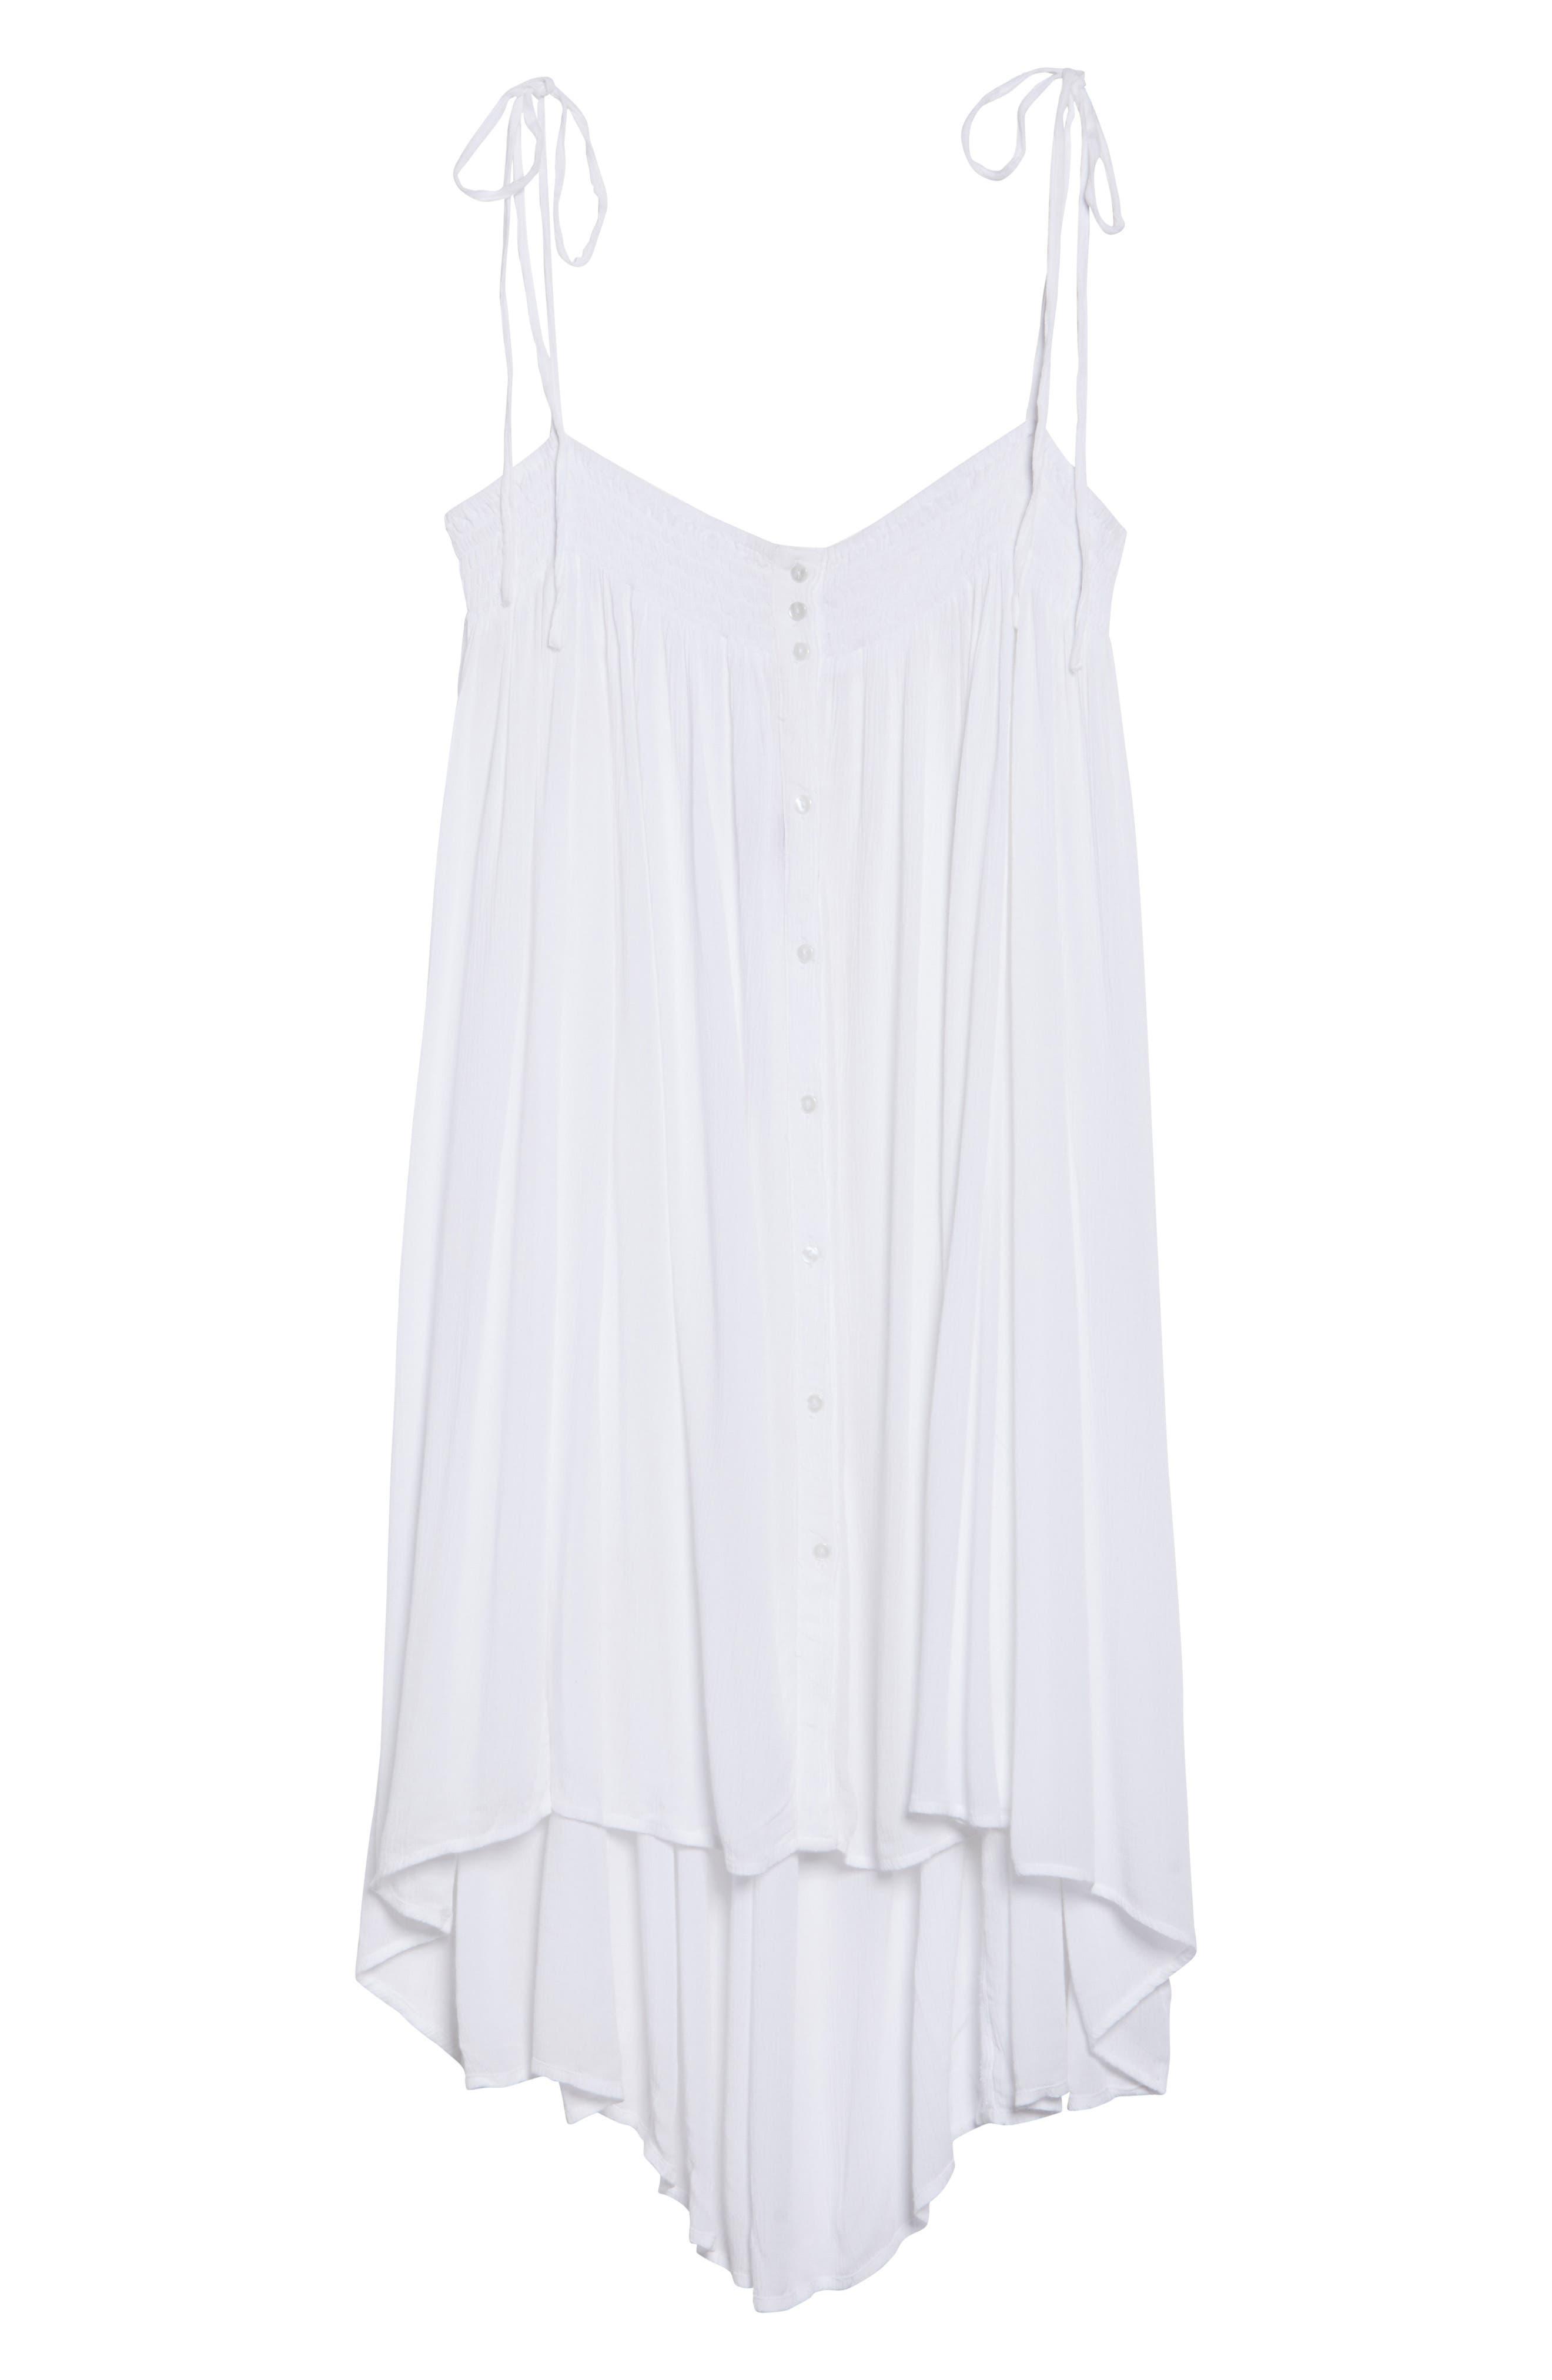 Oliva Cover-Up Dress,                             Alternate thumbnail 6, color,                             100